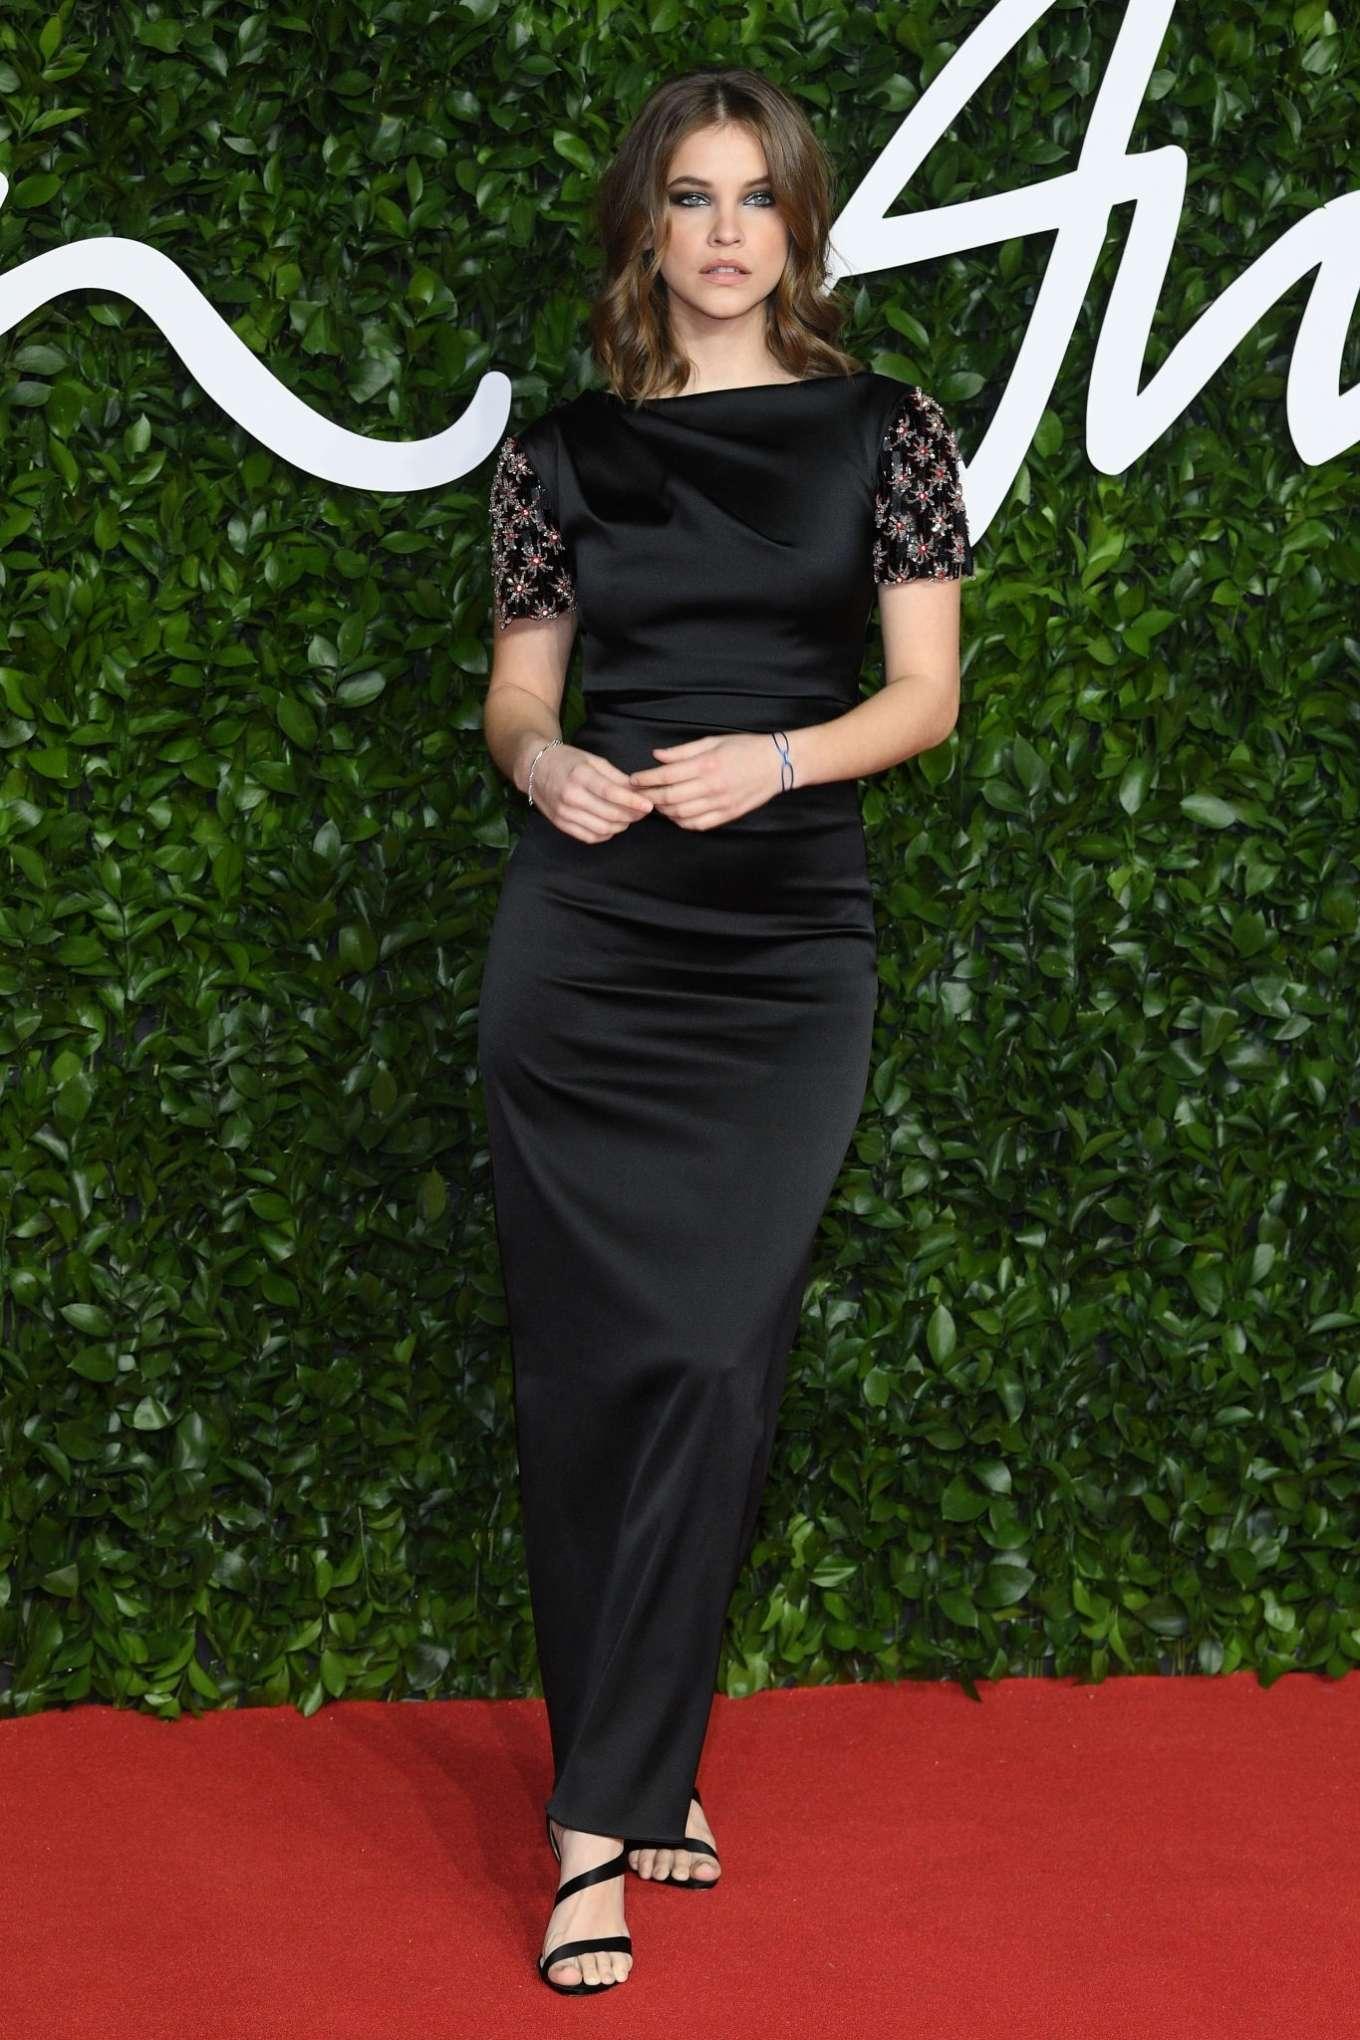 Barbara Palvin 2019 : Barbara Palvin – Fashion Awards 2019 in London-17